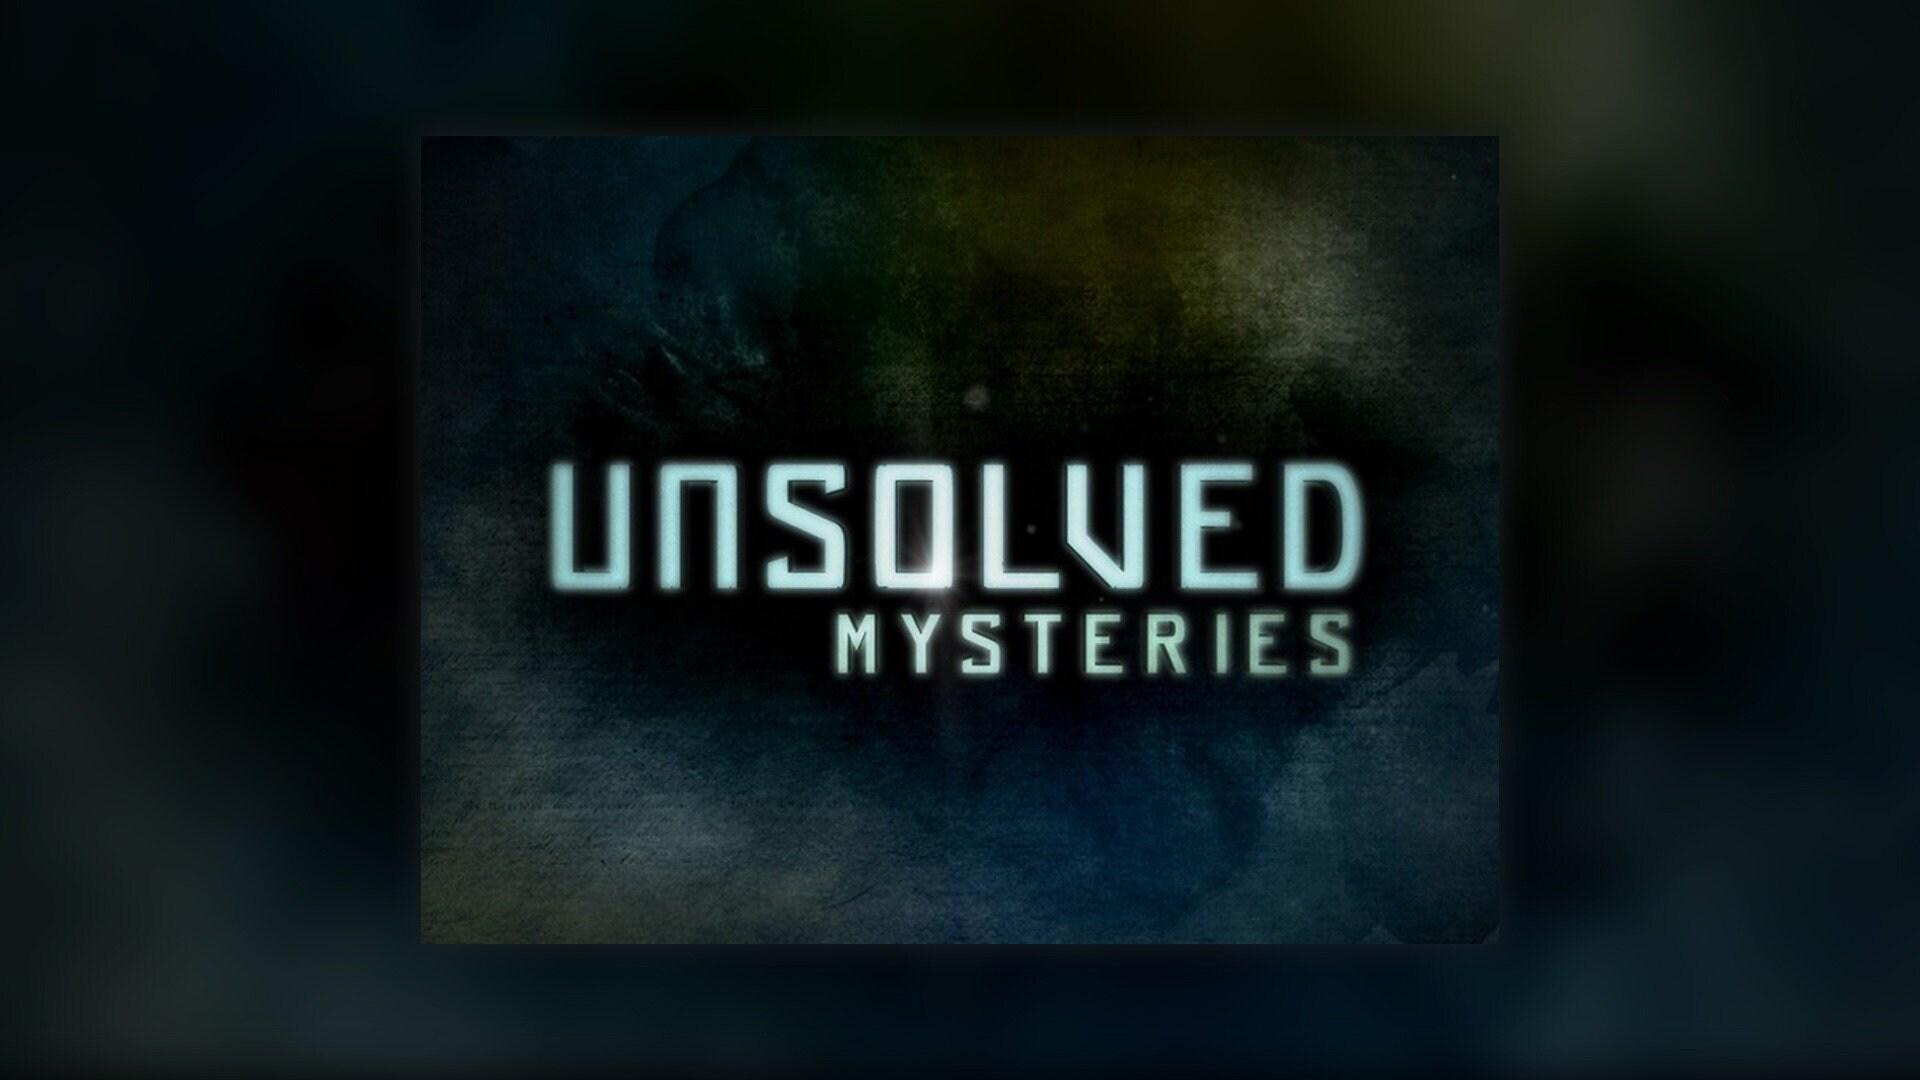 Episode: 1